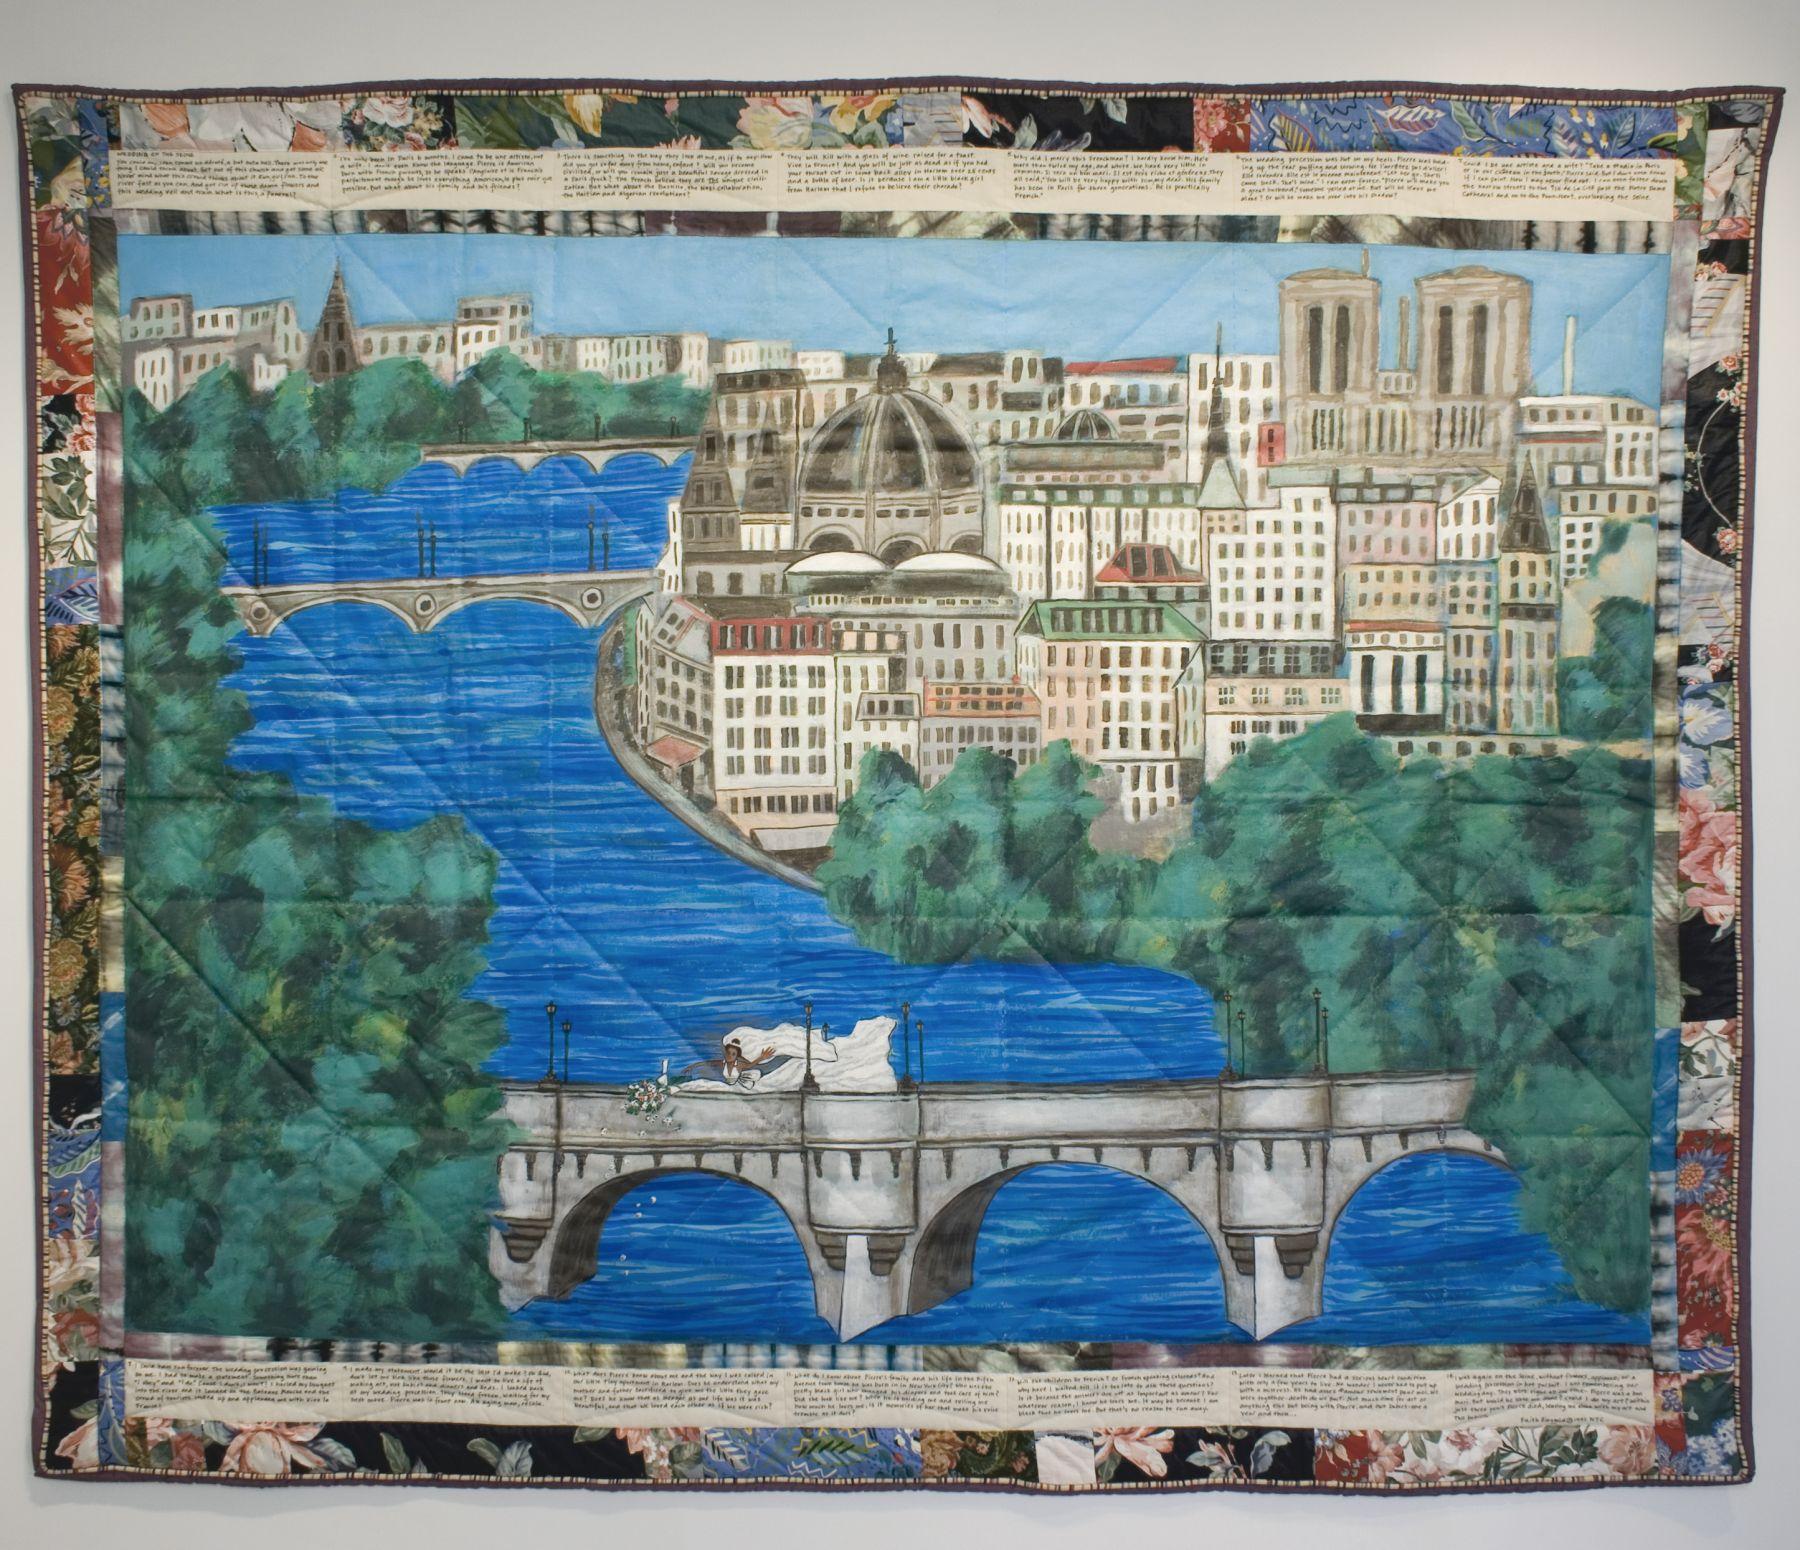 faith ringgold, Wedding on the Seine, 1991, acrylic on canvas, tie-dyed, pieced fabric border, 74 x 89 inches